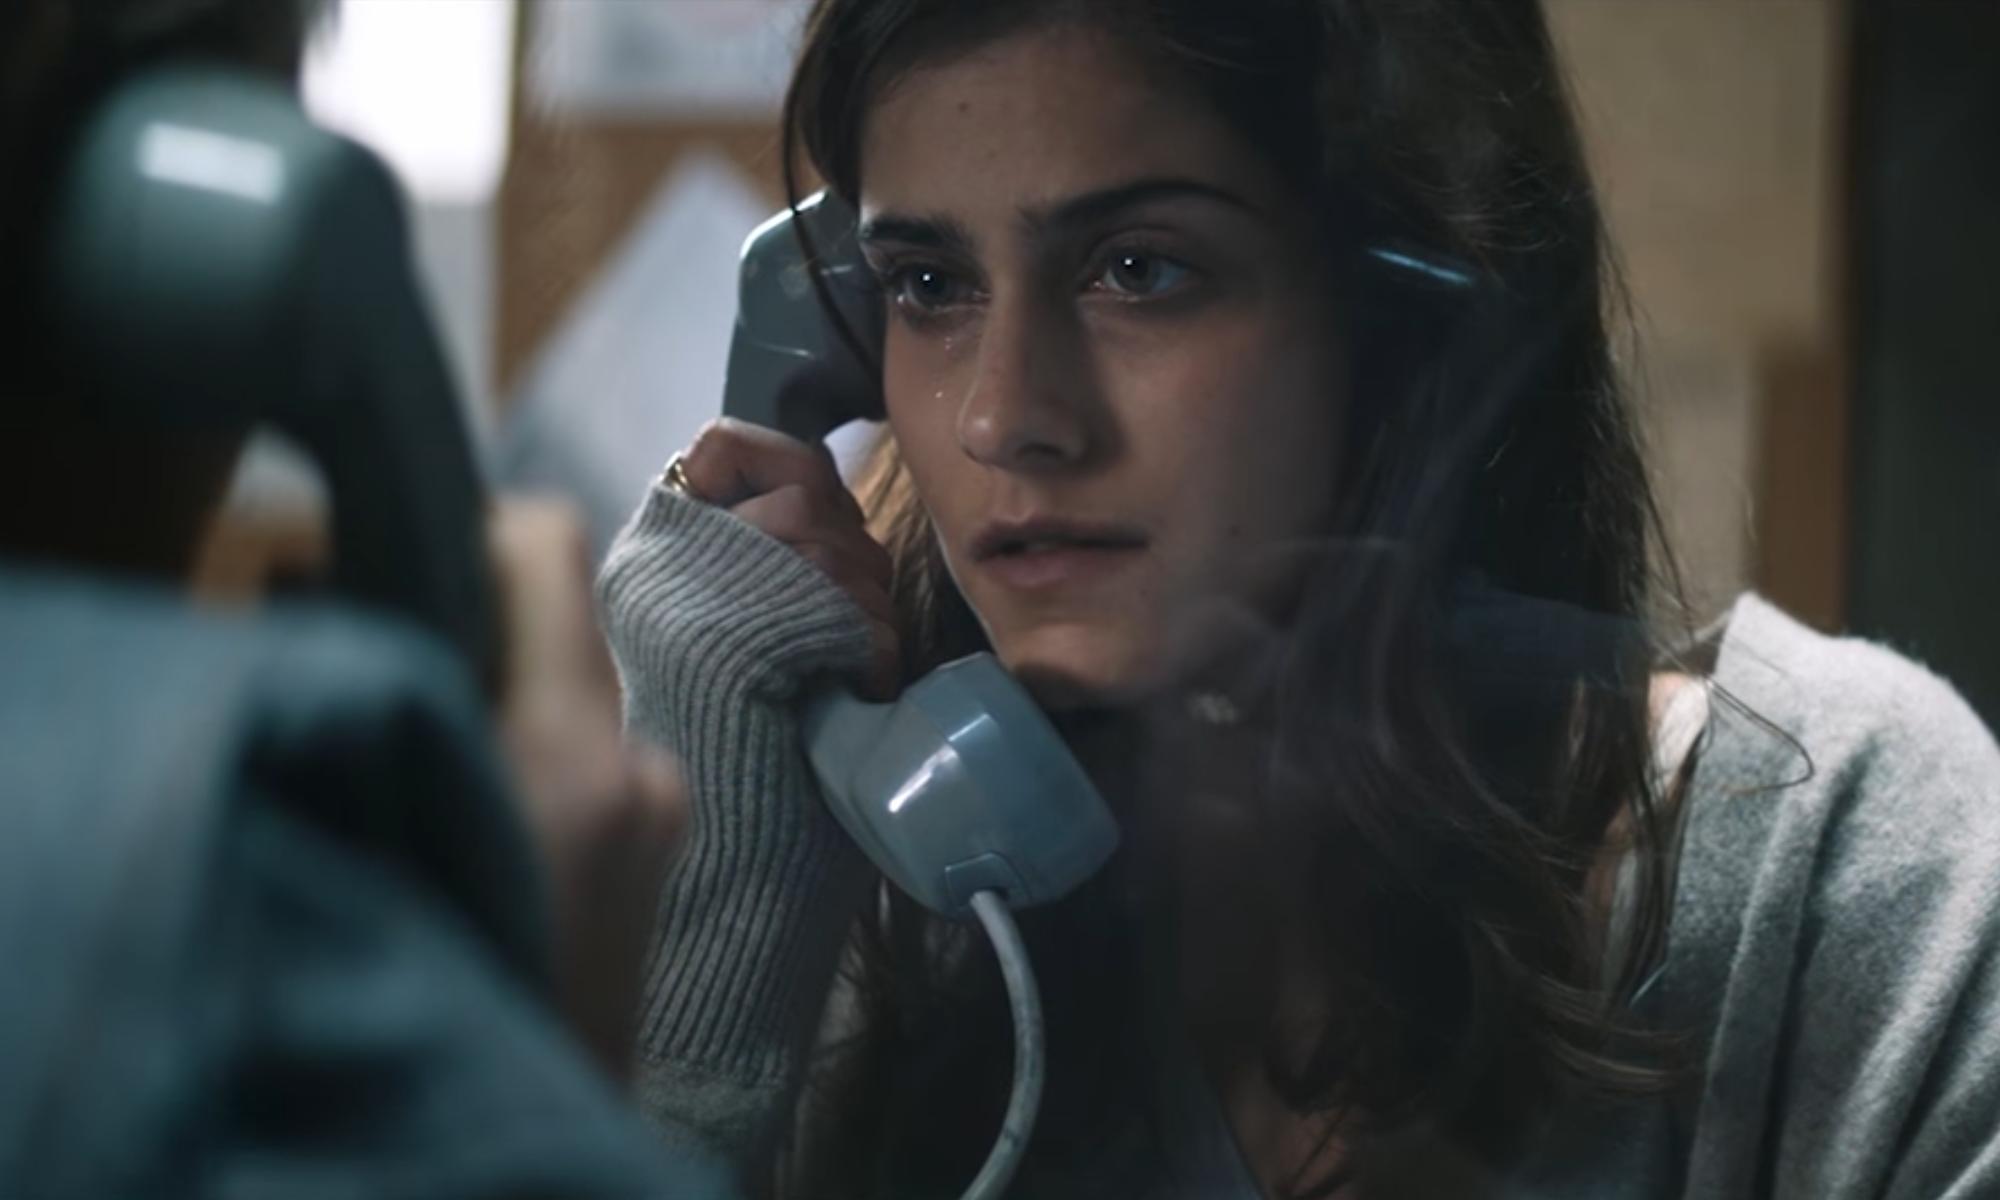 L'Appel, campagne vidéo FNSF 3919 (2016)